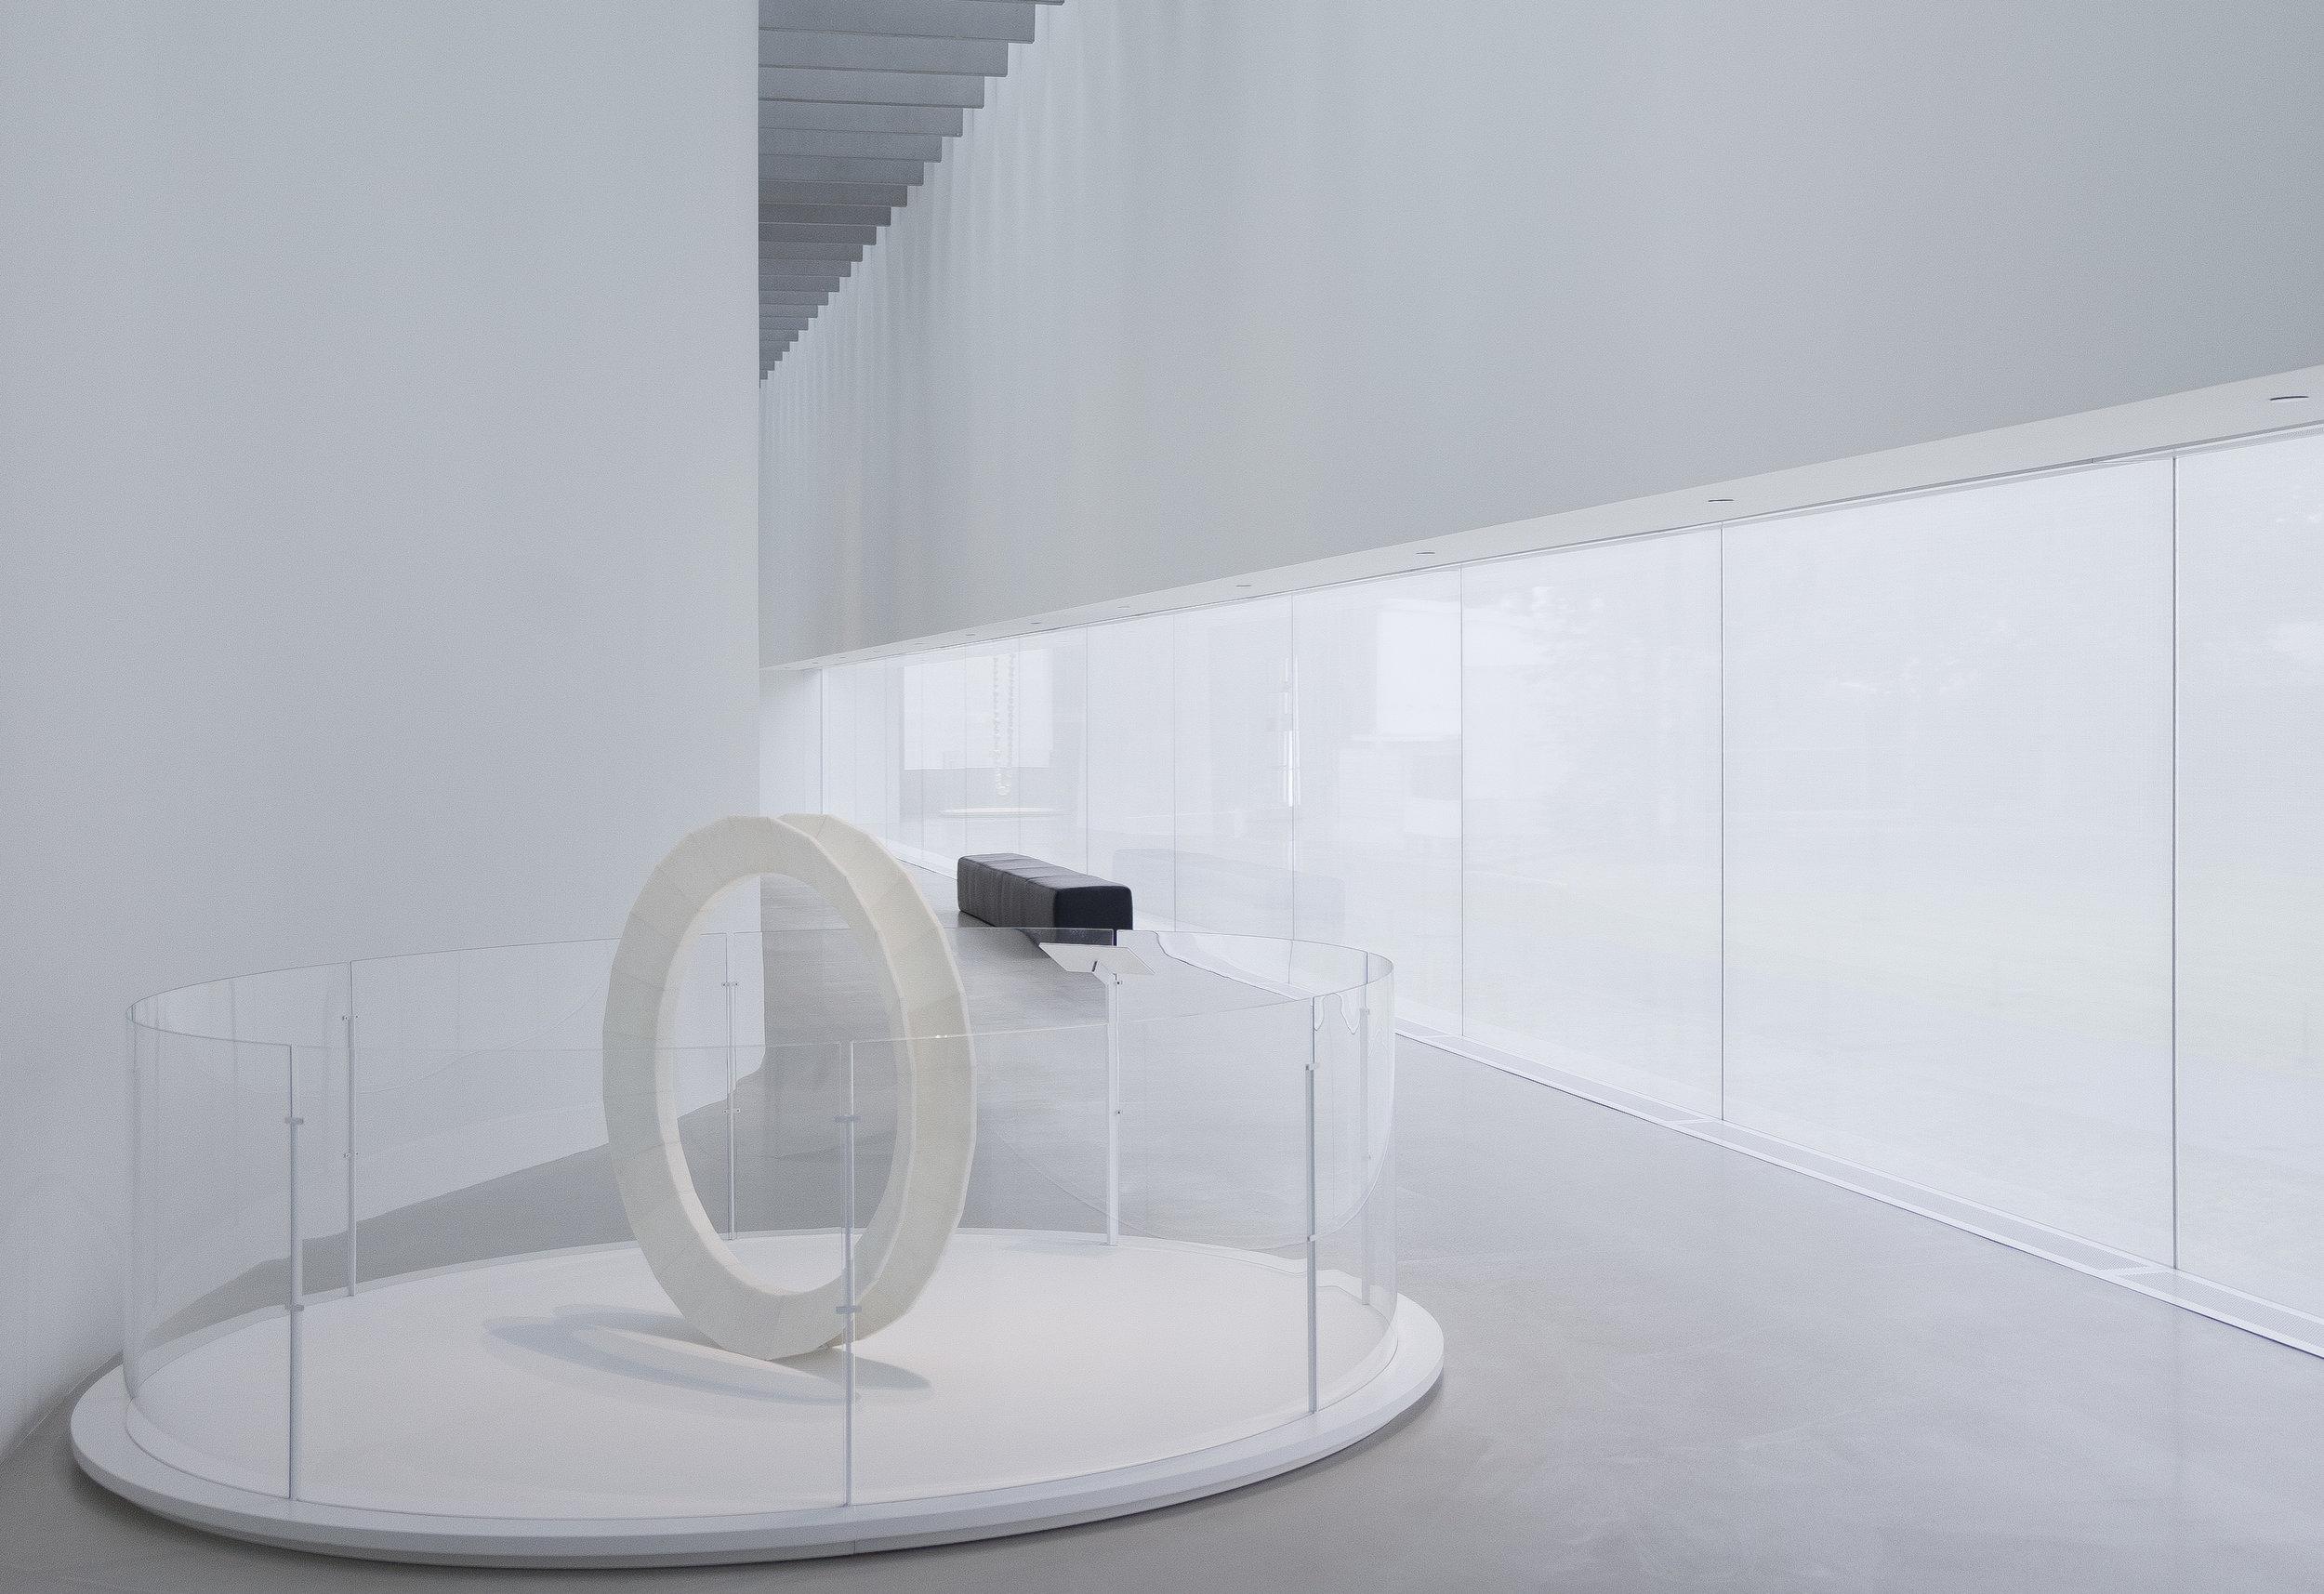 ramsey bakhoum - architectural photographer - corning museum (1 of 1)-17.jpg